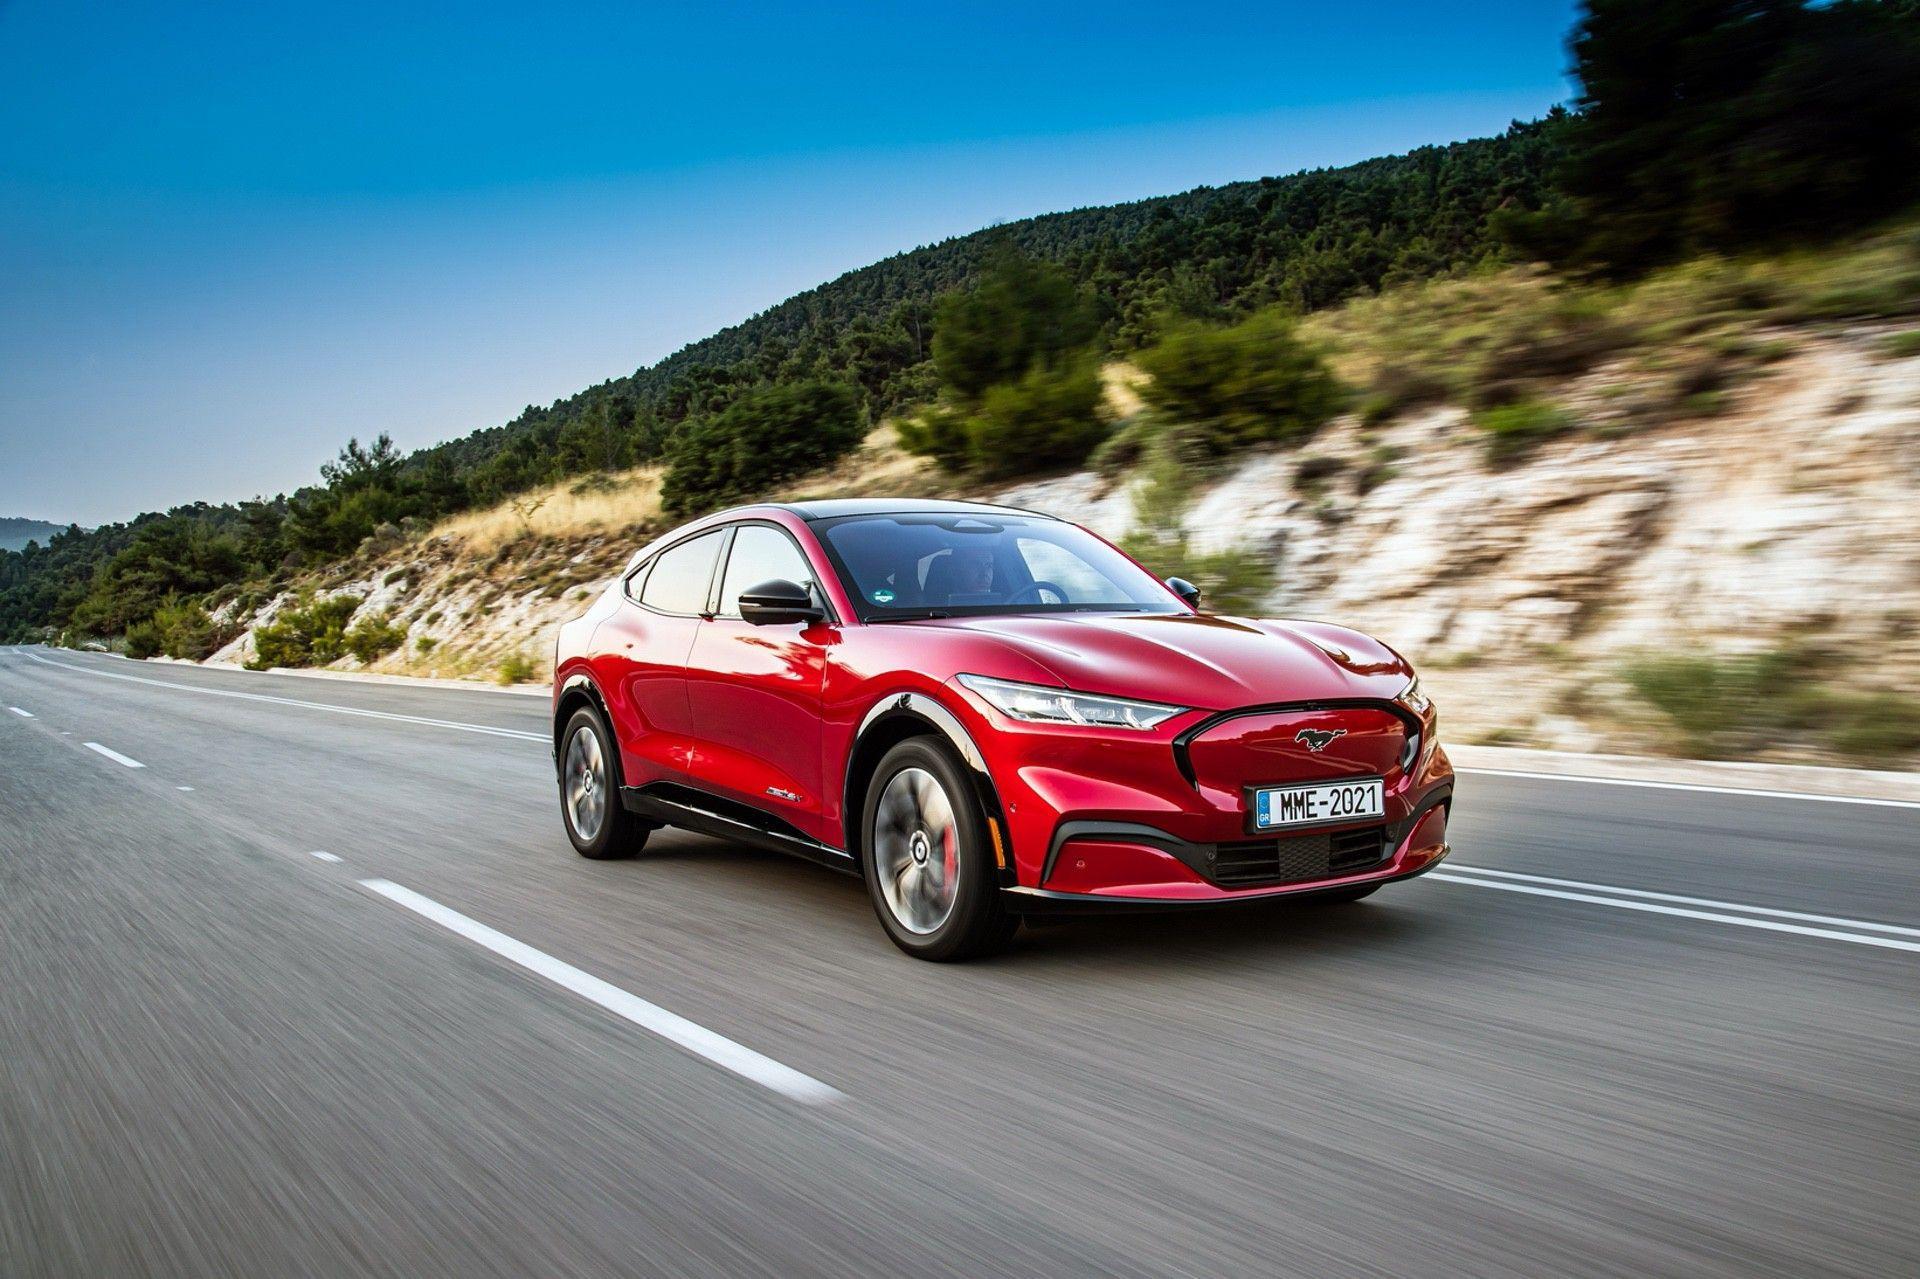 Ford_Mustang_Mach-E_greek_presskit-0067